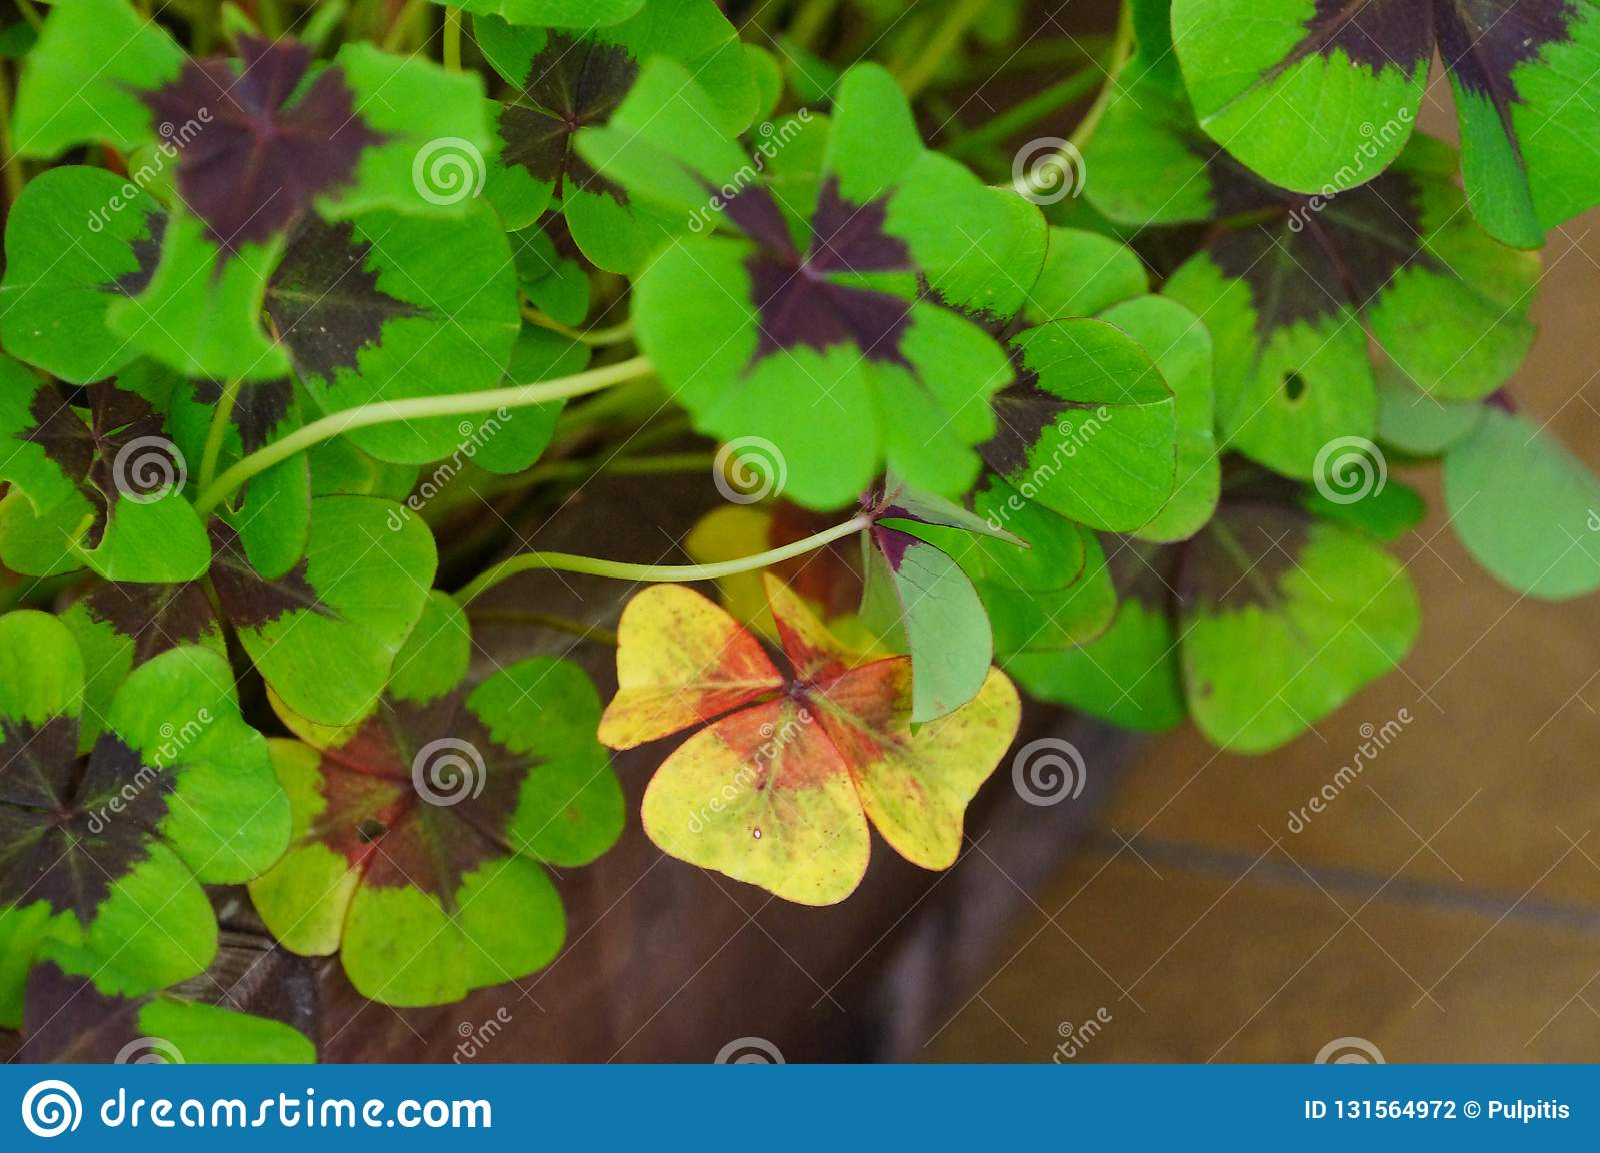 Four Leaf Clover Plant In Altai Republic Russia Stock Photo